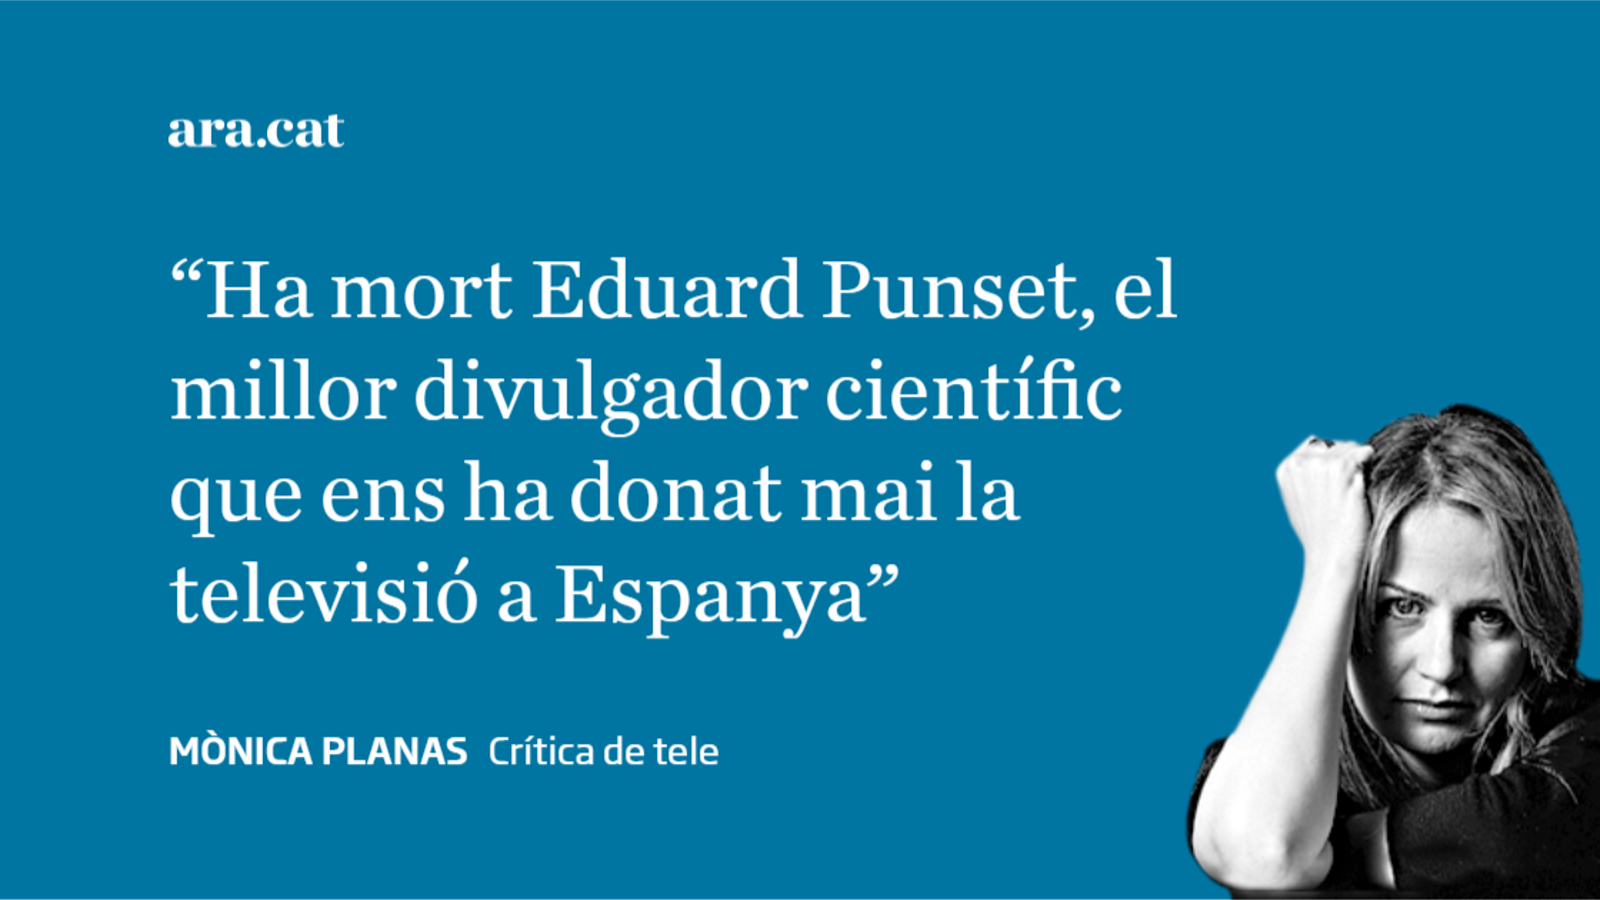 Eduard Punset: adeu al més savi de la tele